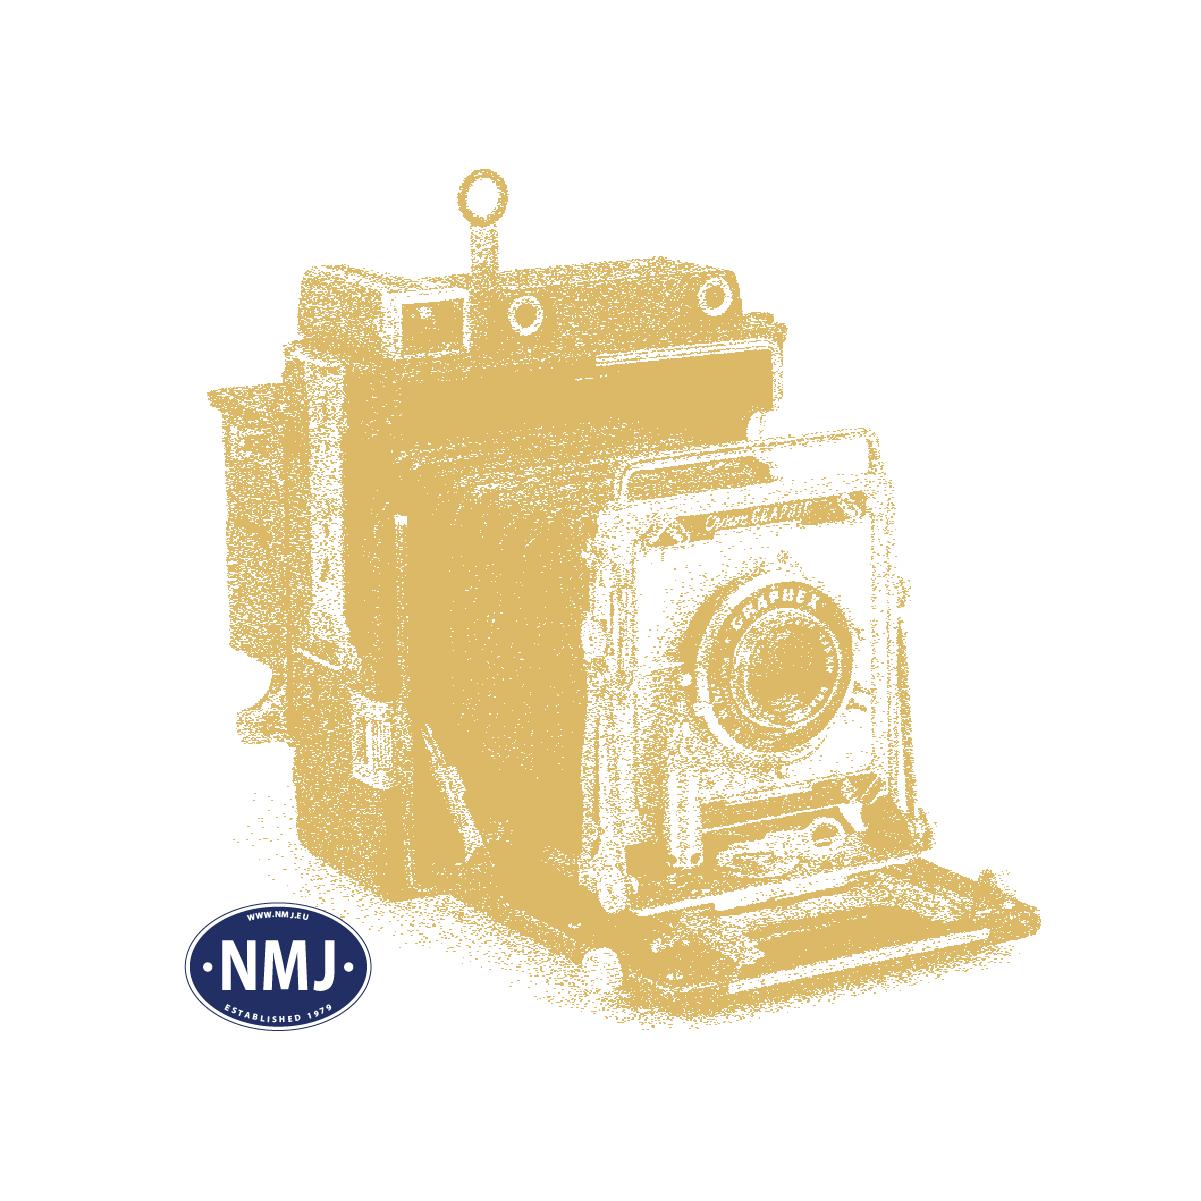 NMJS68A-1 - NMJ Superline Modell des NSB E-Triebzug BM 68A 3 teilig., rotbraun, Ursprungsvariante